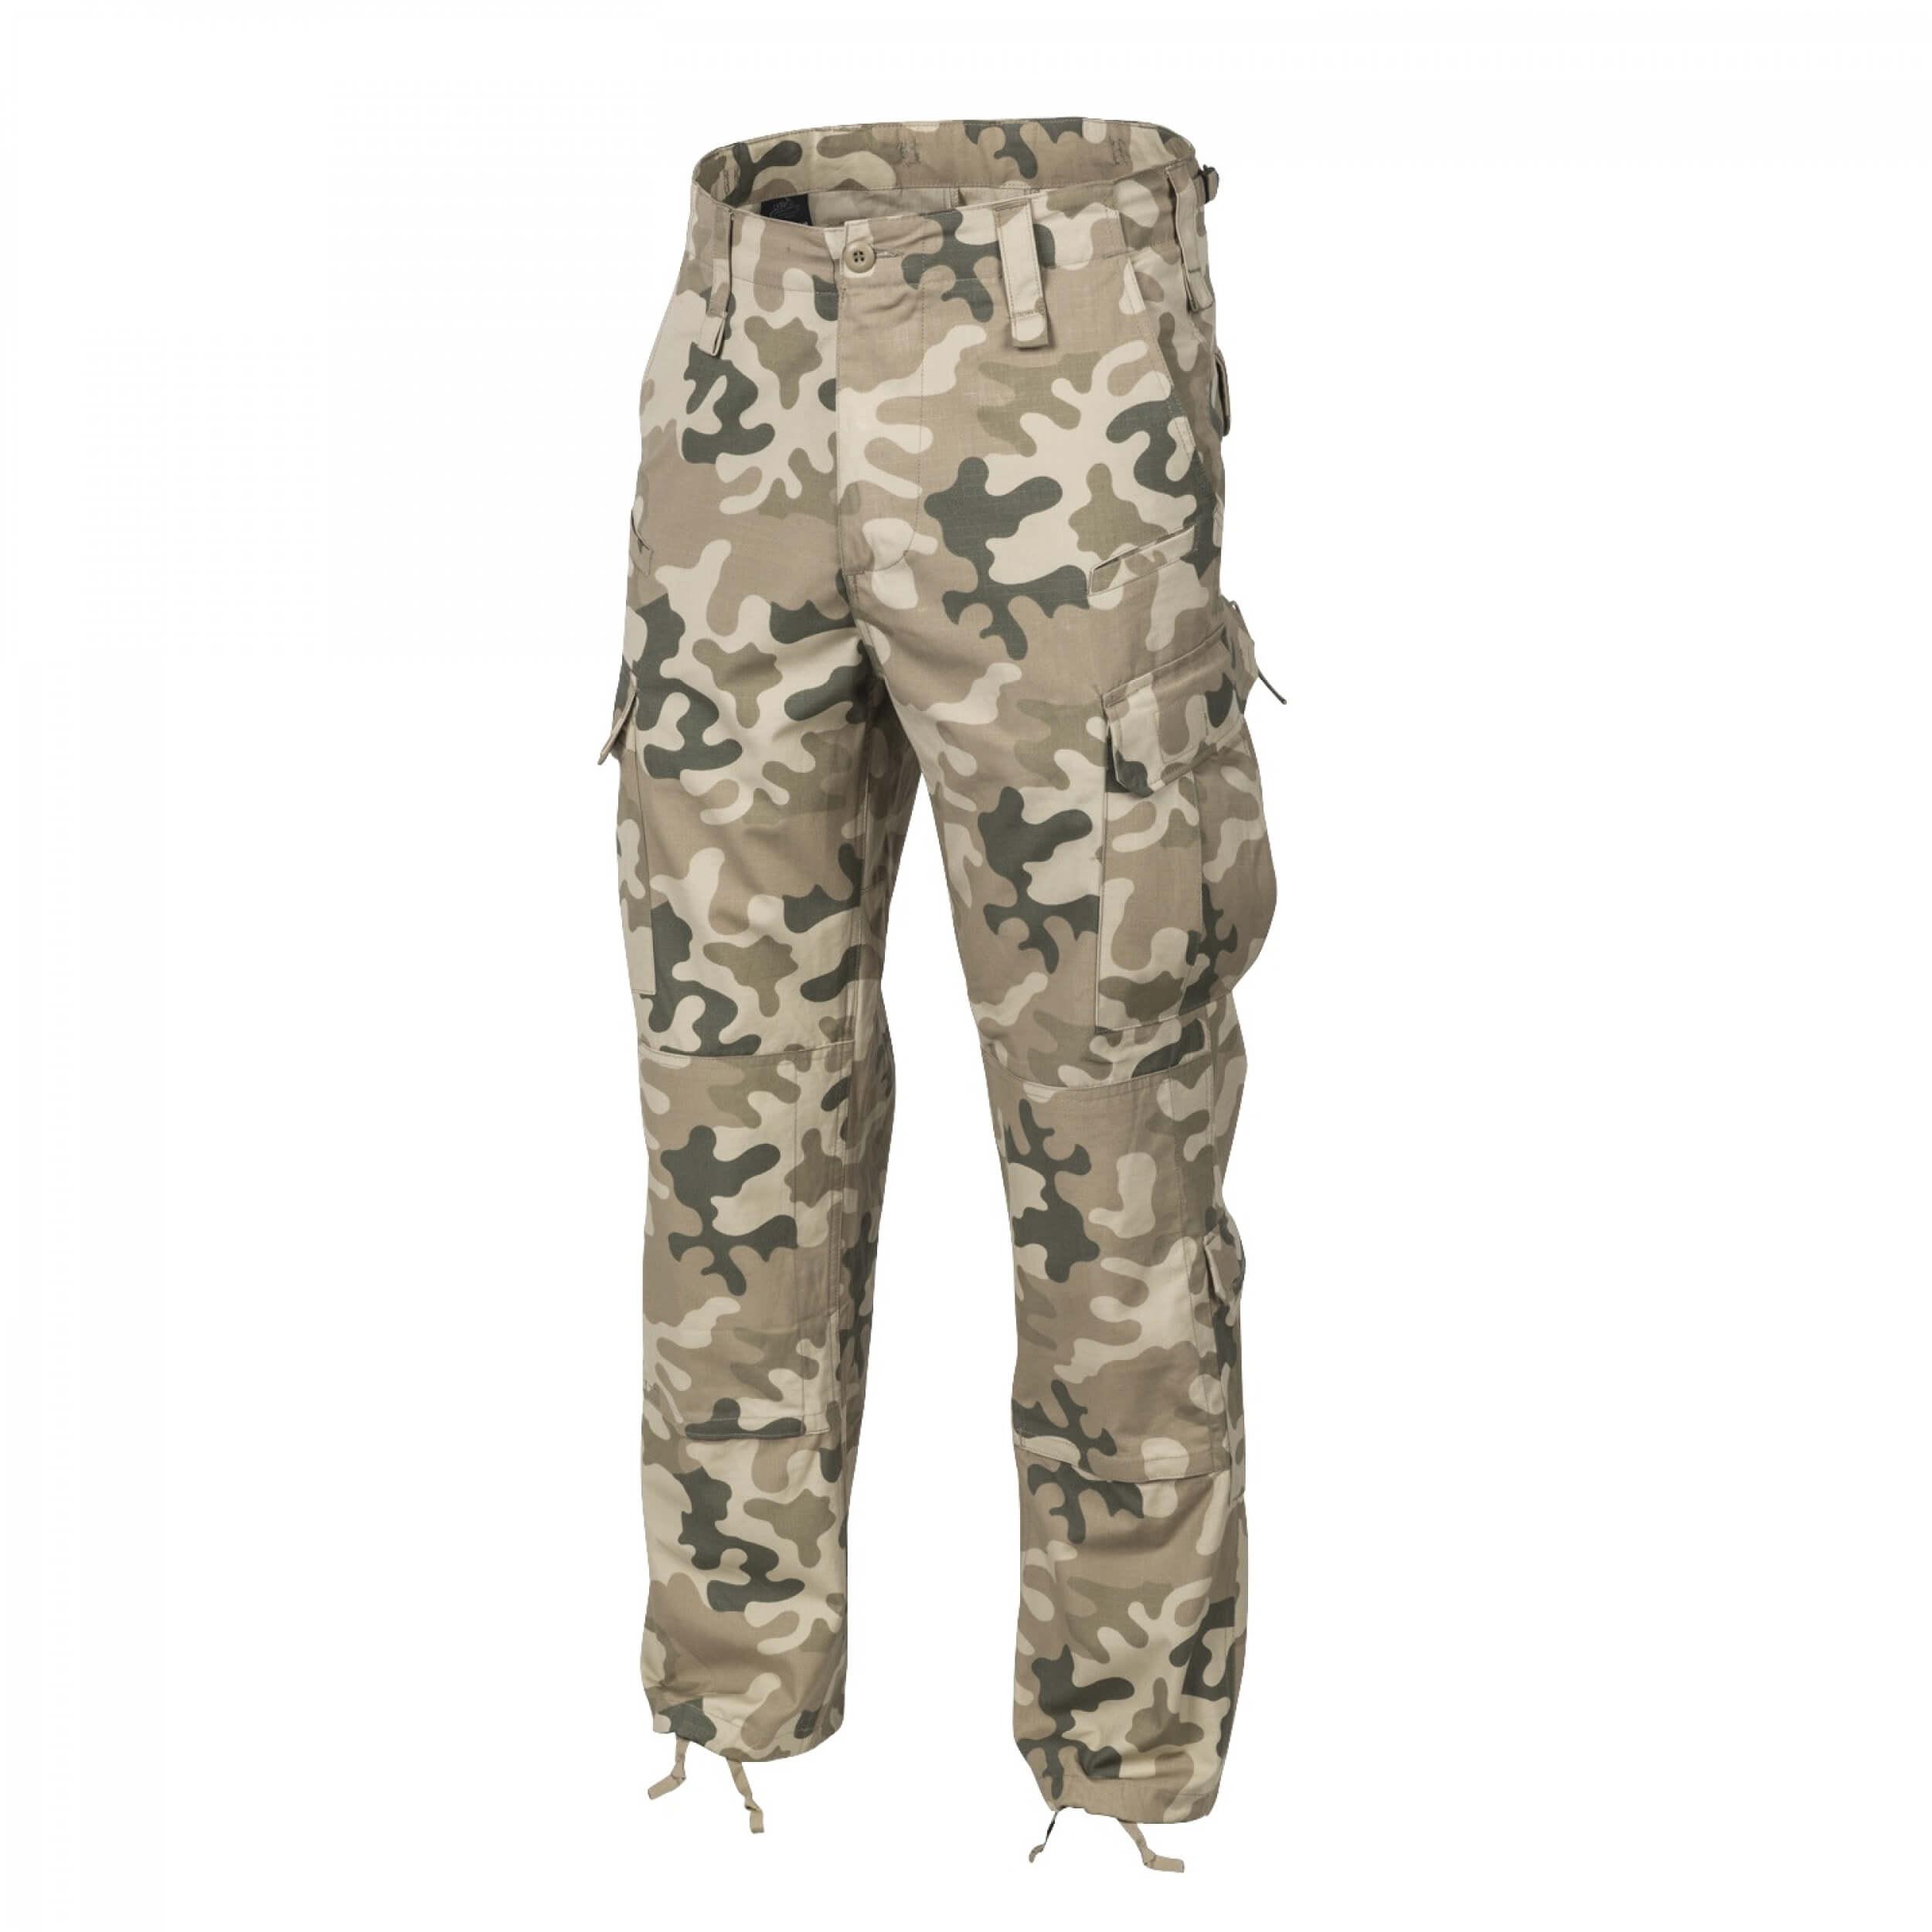 Helikon-Tex CPU Hose Combat Patrol Uniform Cotton Ripstop - PL Desert